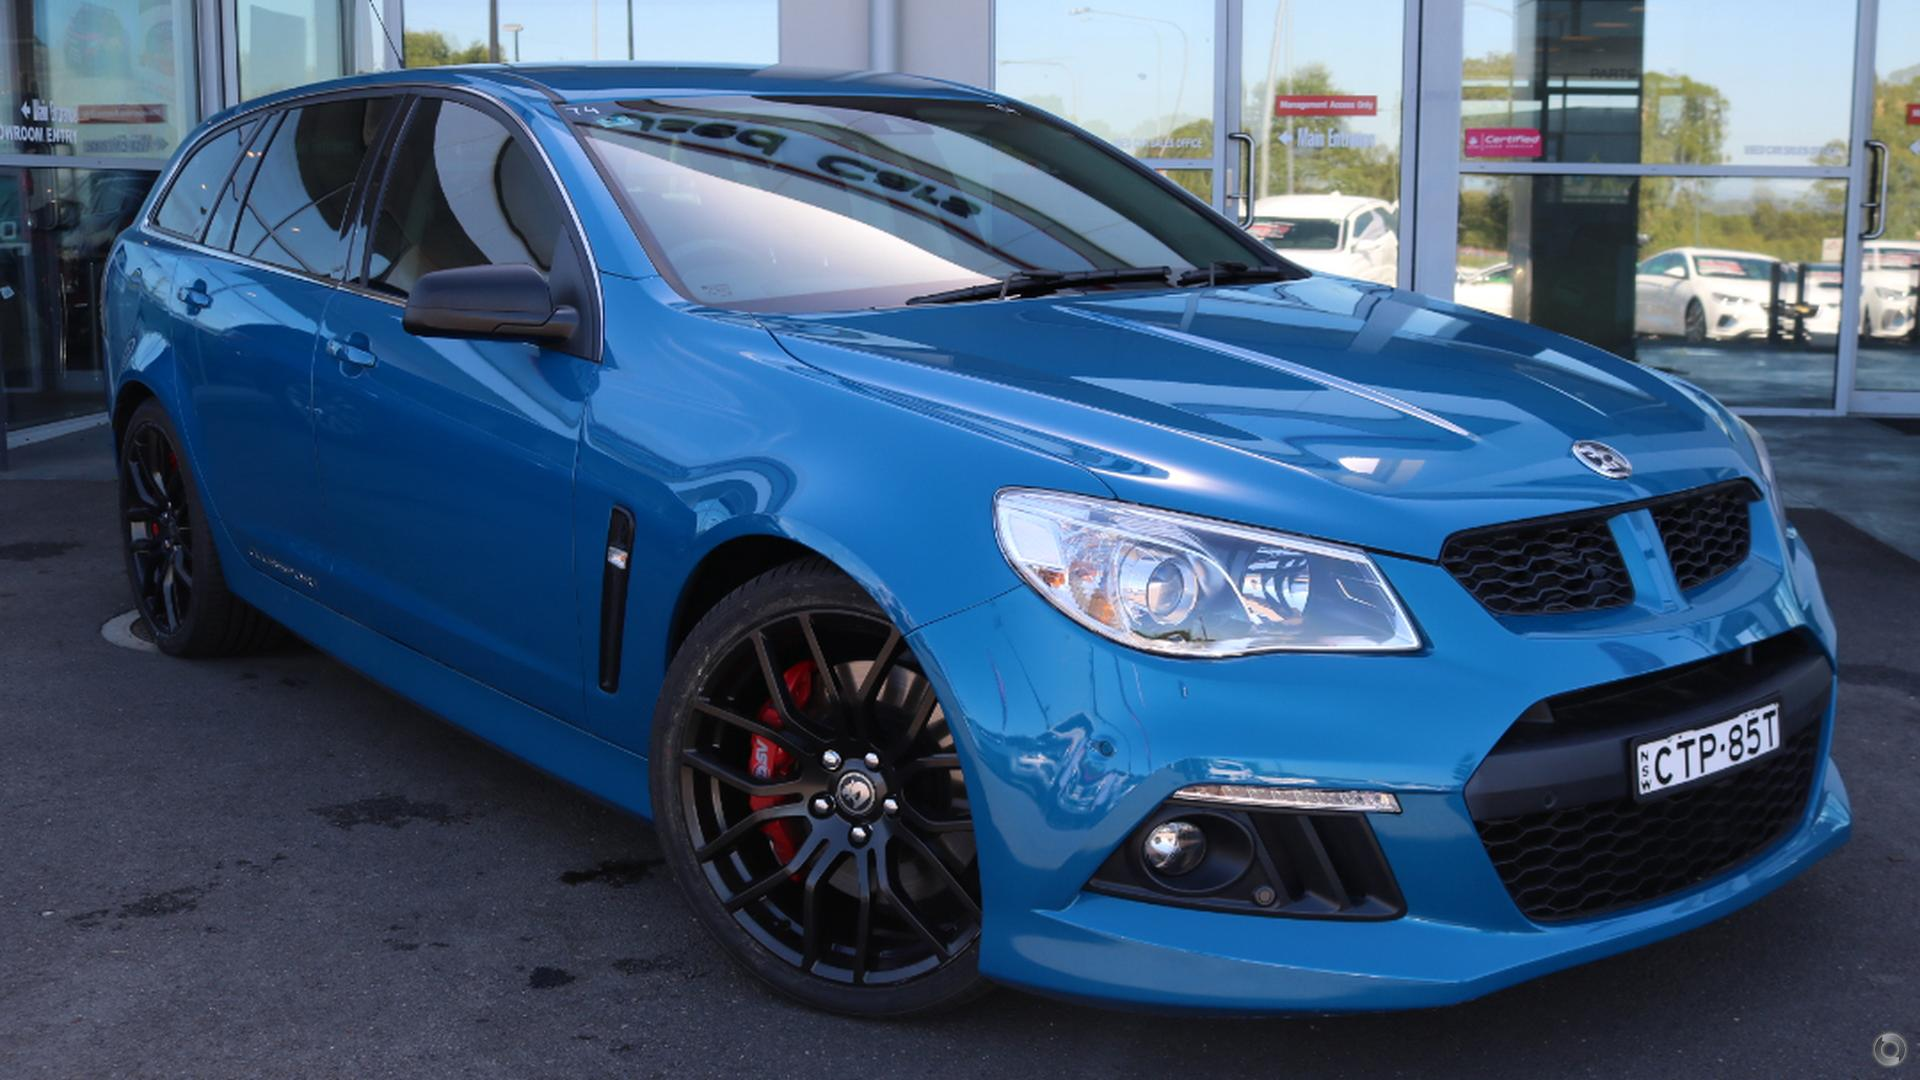 2013 Holden Special Vehicles Clubsport GEN-F